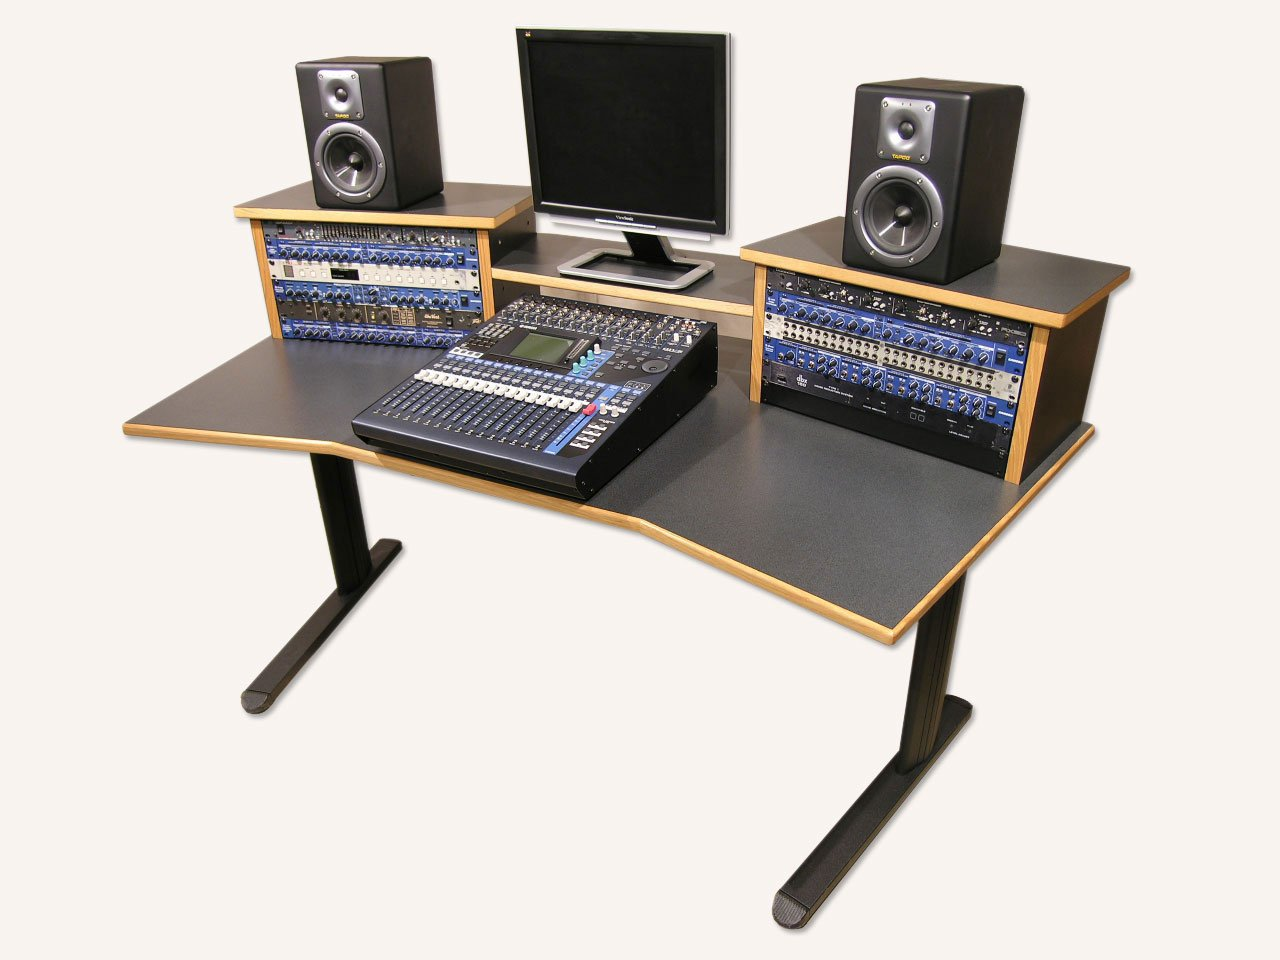 DigiStation Home Studio Desk